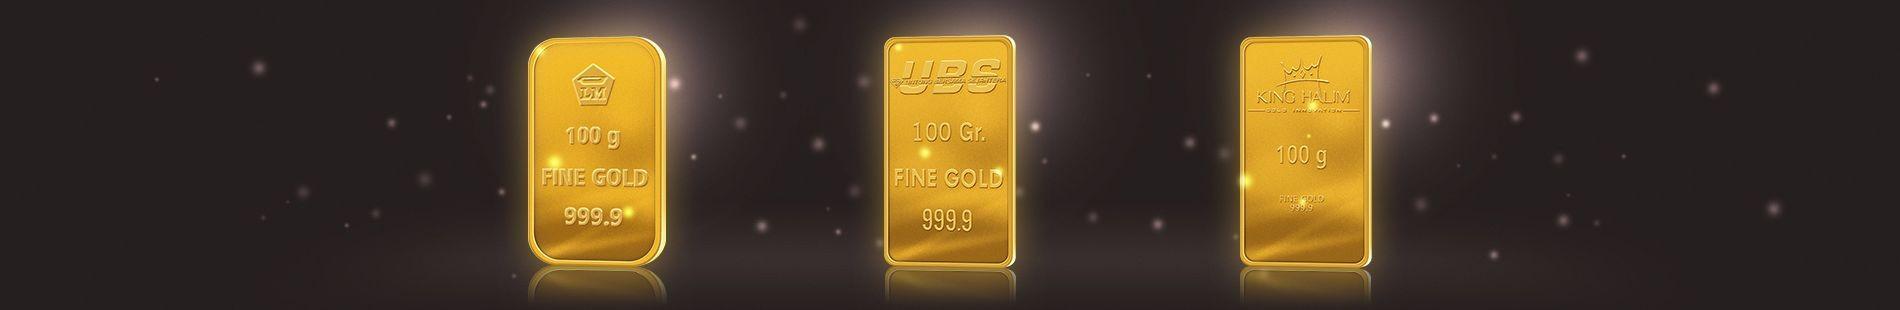 Indo Gold